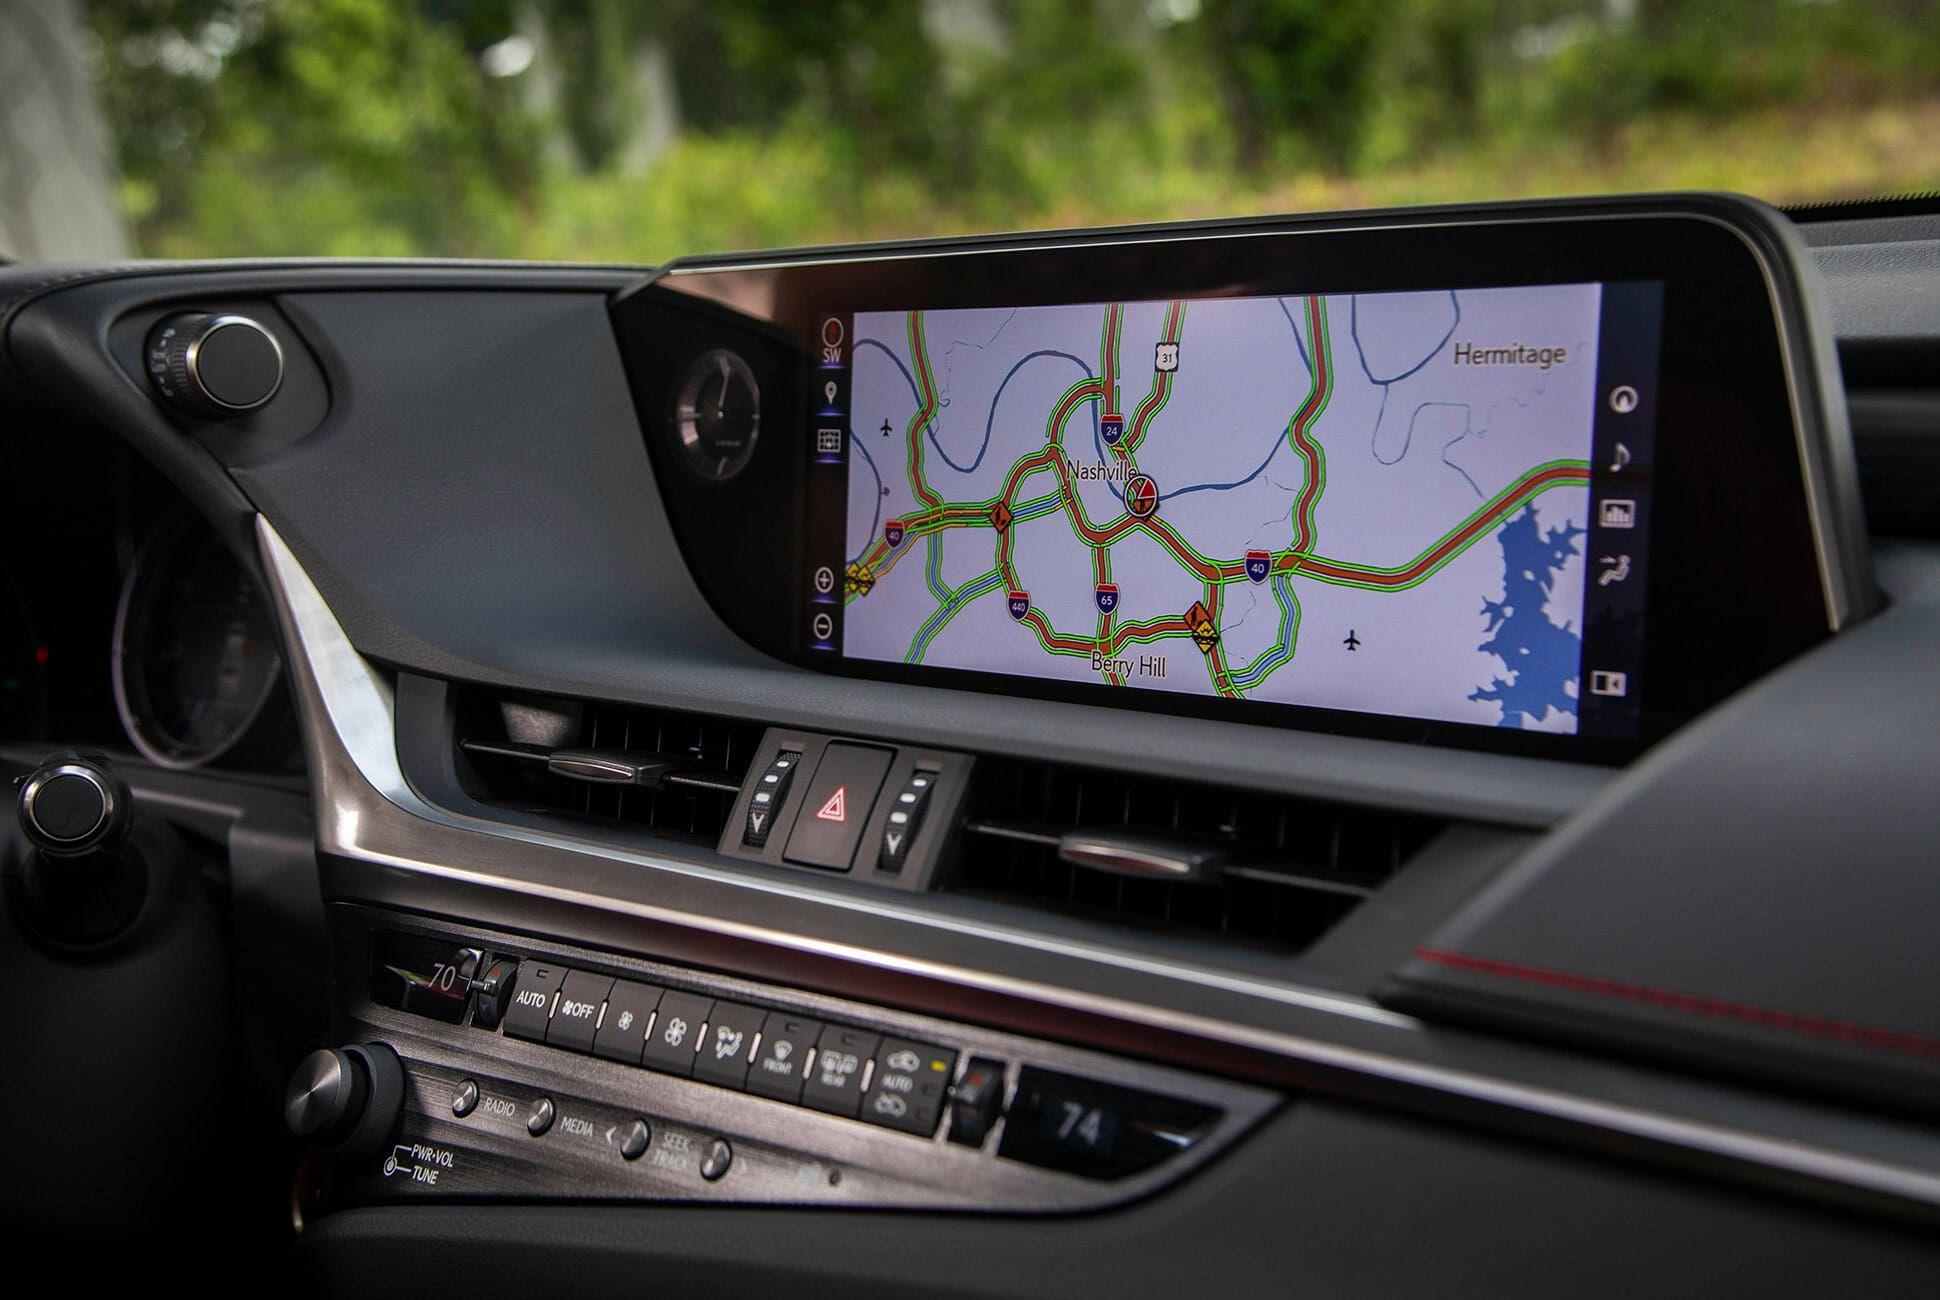 2019-Lexus-ES-350-F-Sport-Review-gear-patrol-slide-13